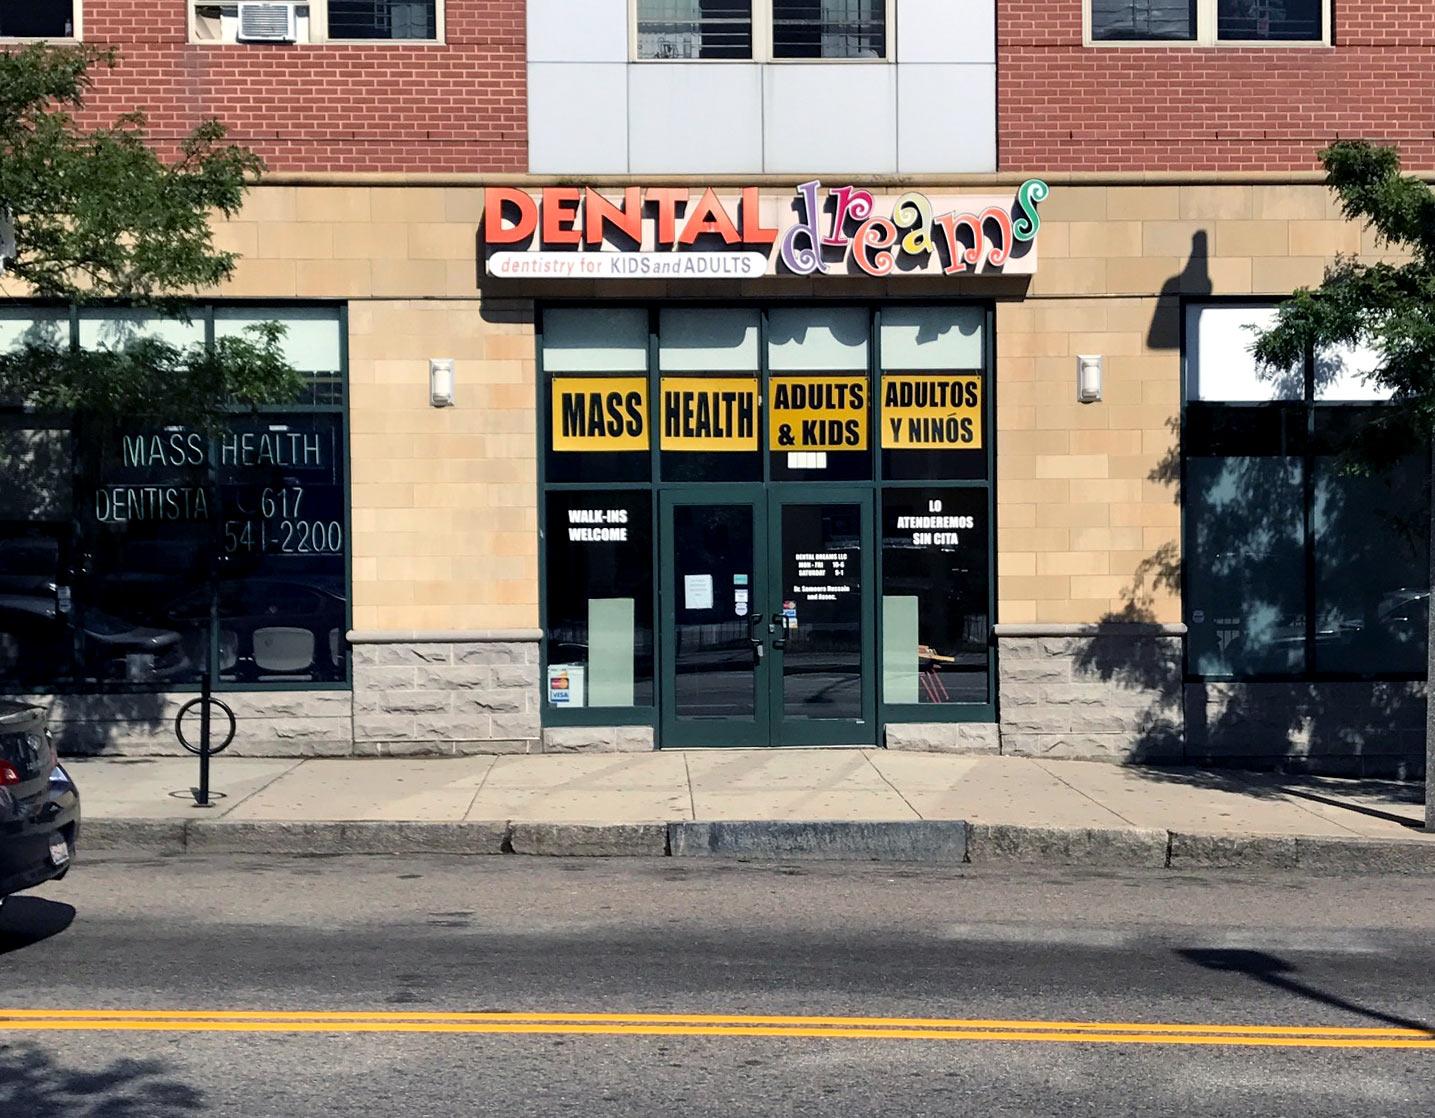 Photo of Dental Dreams in Roxbury, MA 02119